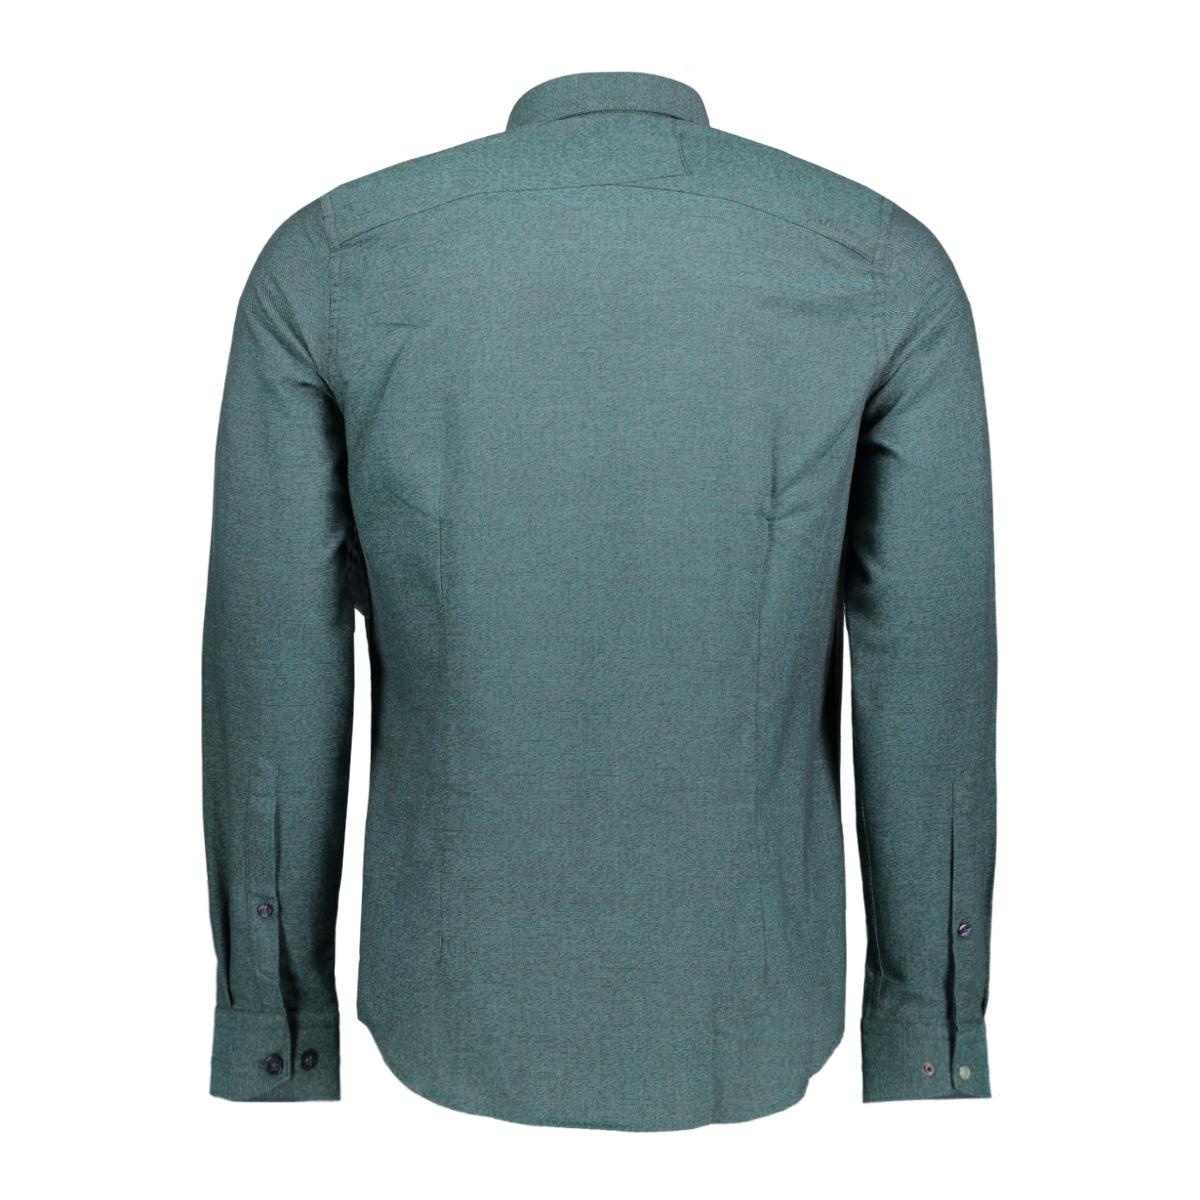 csi176637 cast iron overhemd 6513